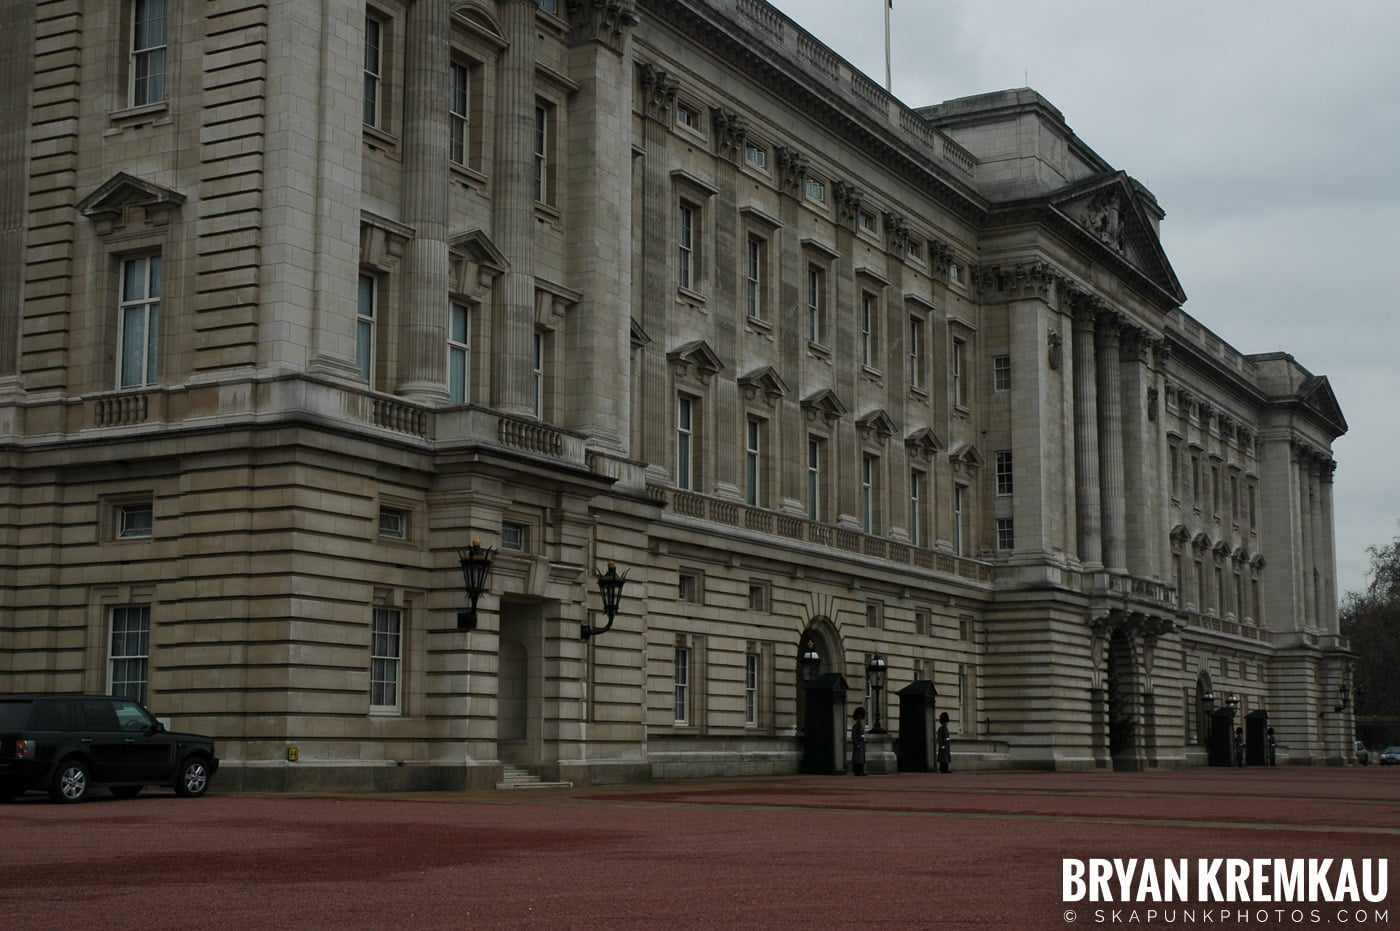 London, England - Day 5 - 12.20.05 (14)